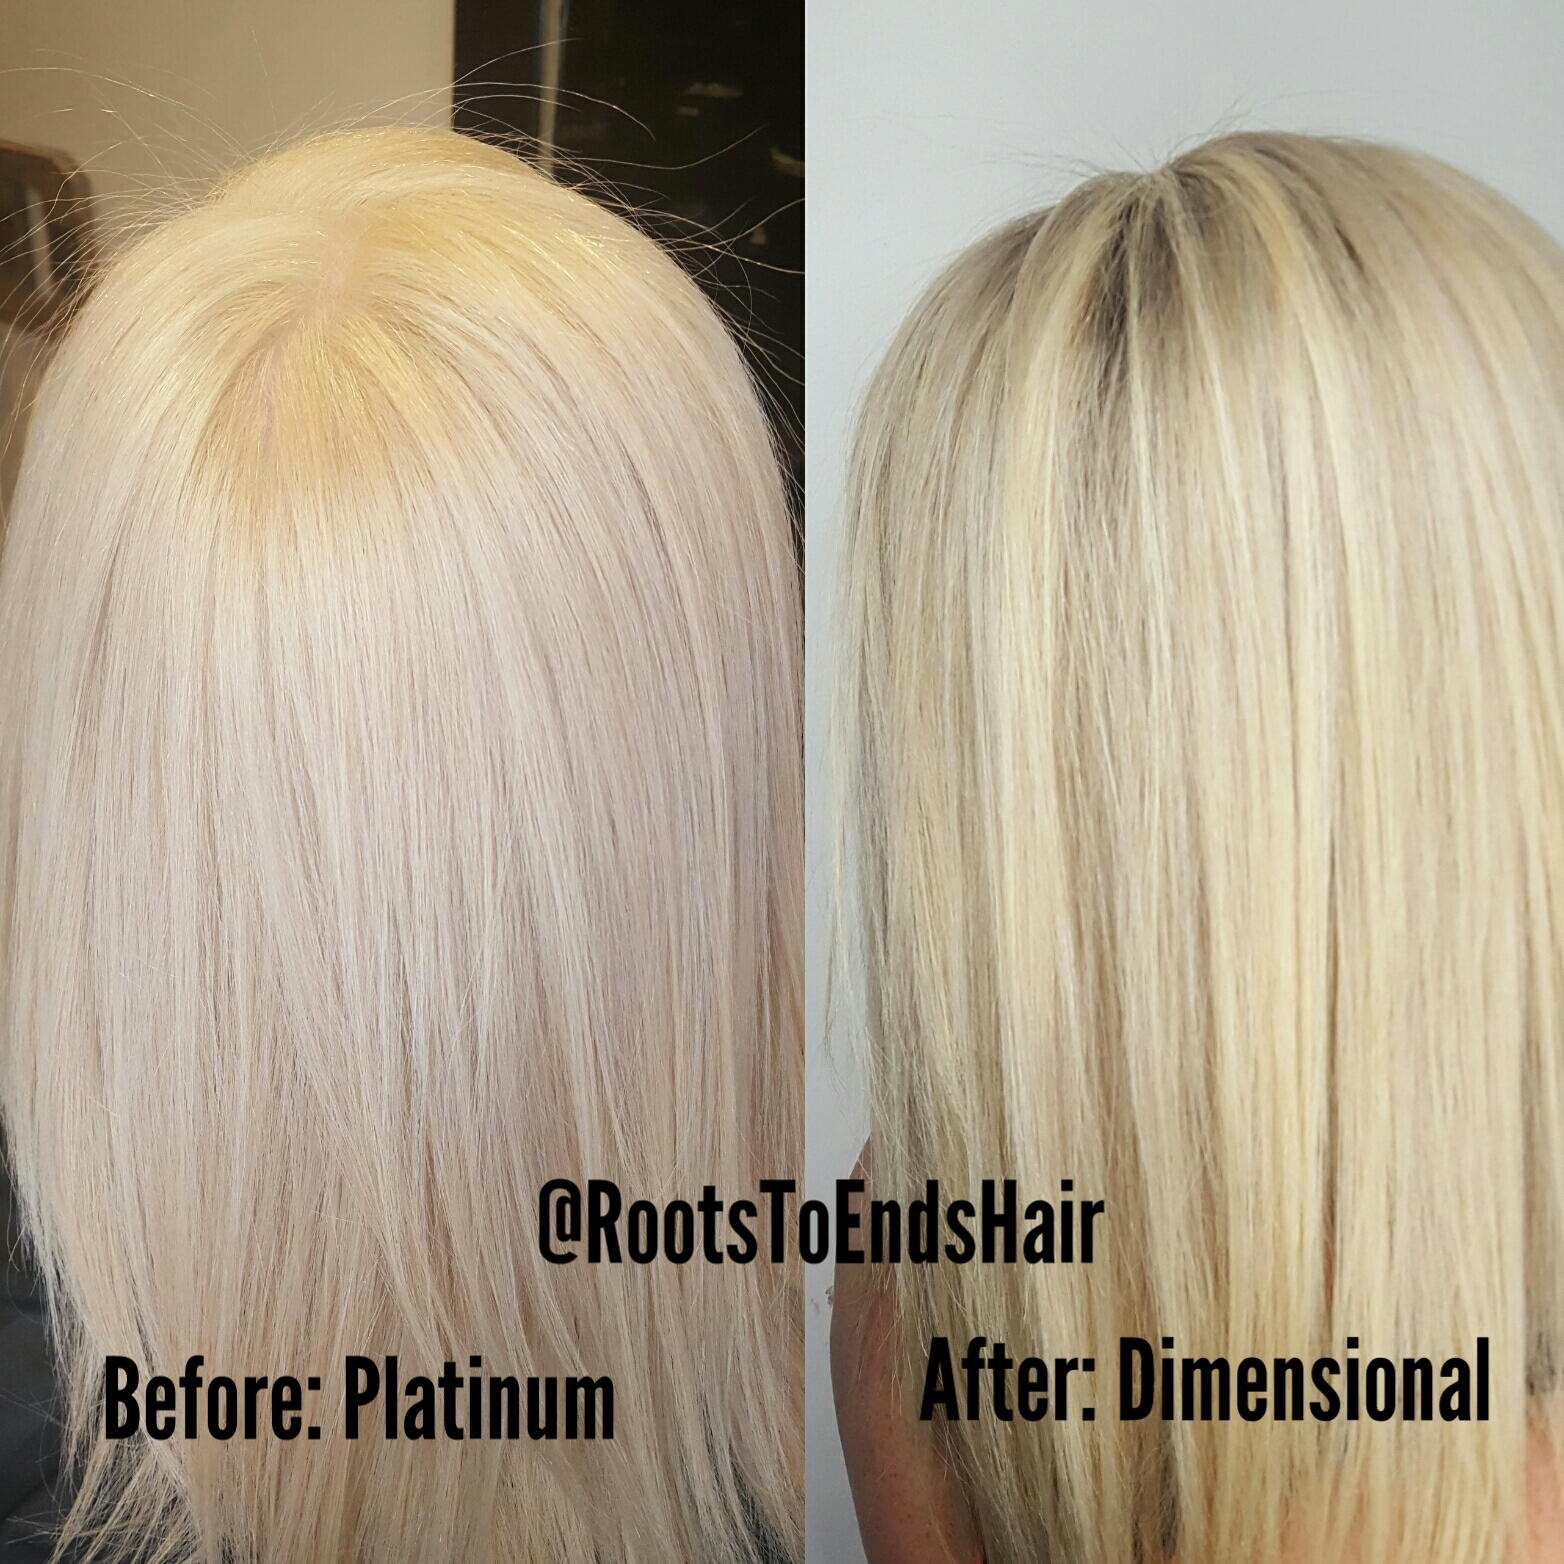 Blonde hair for days.